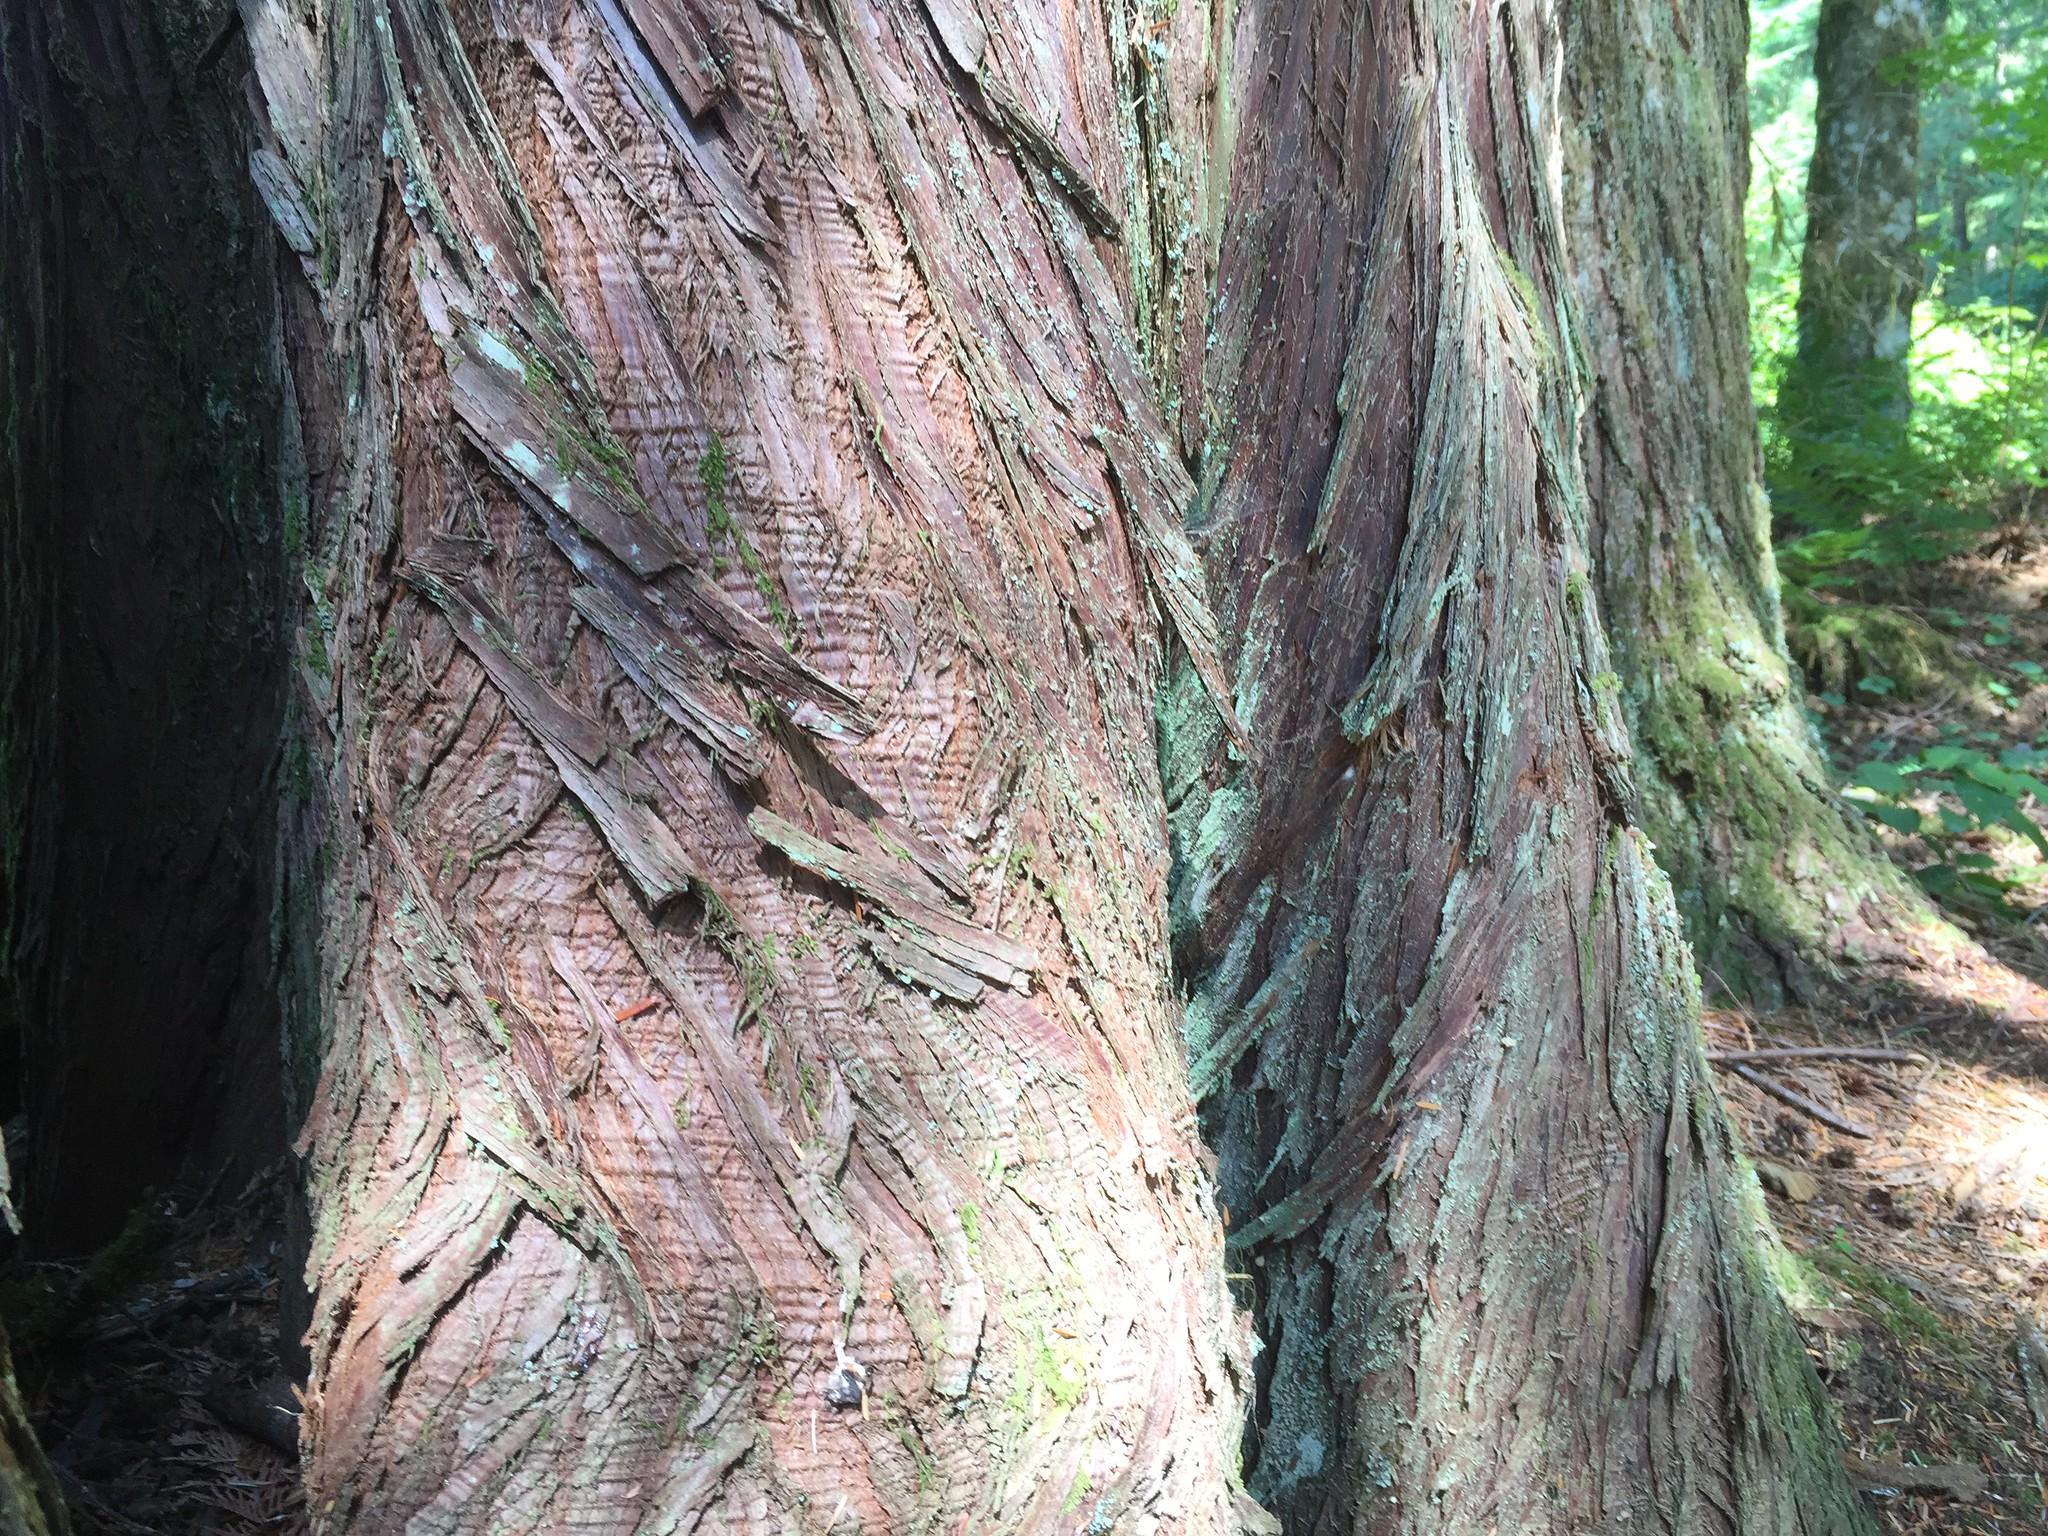 Woven Bark